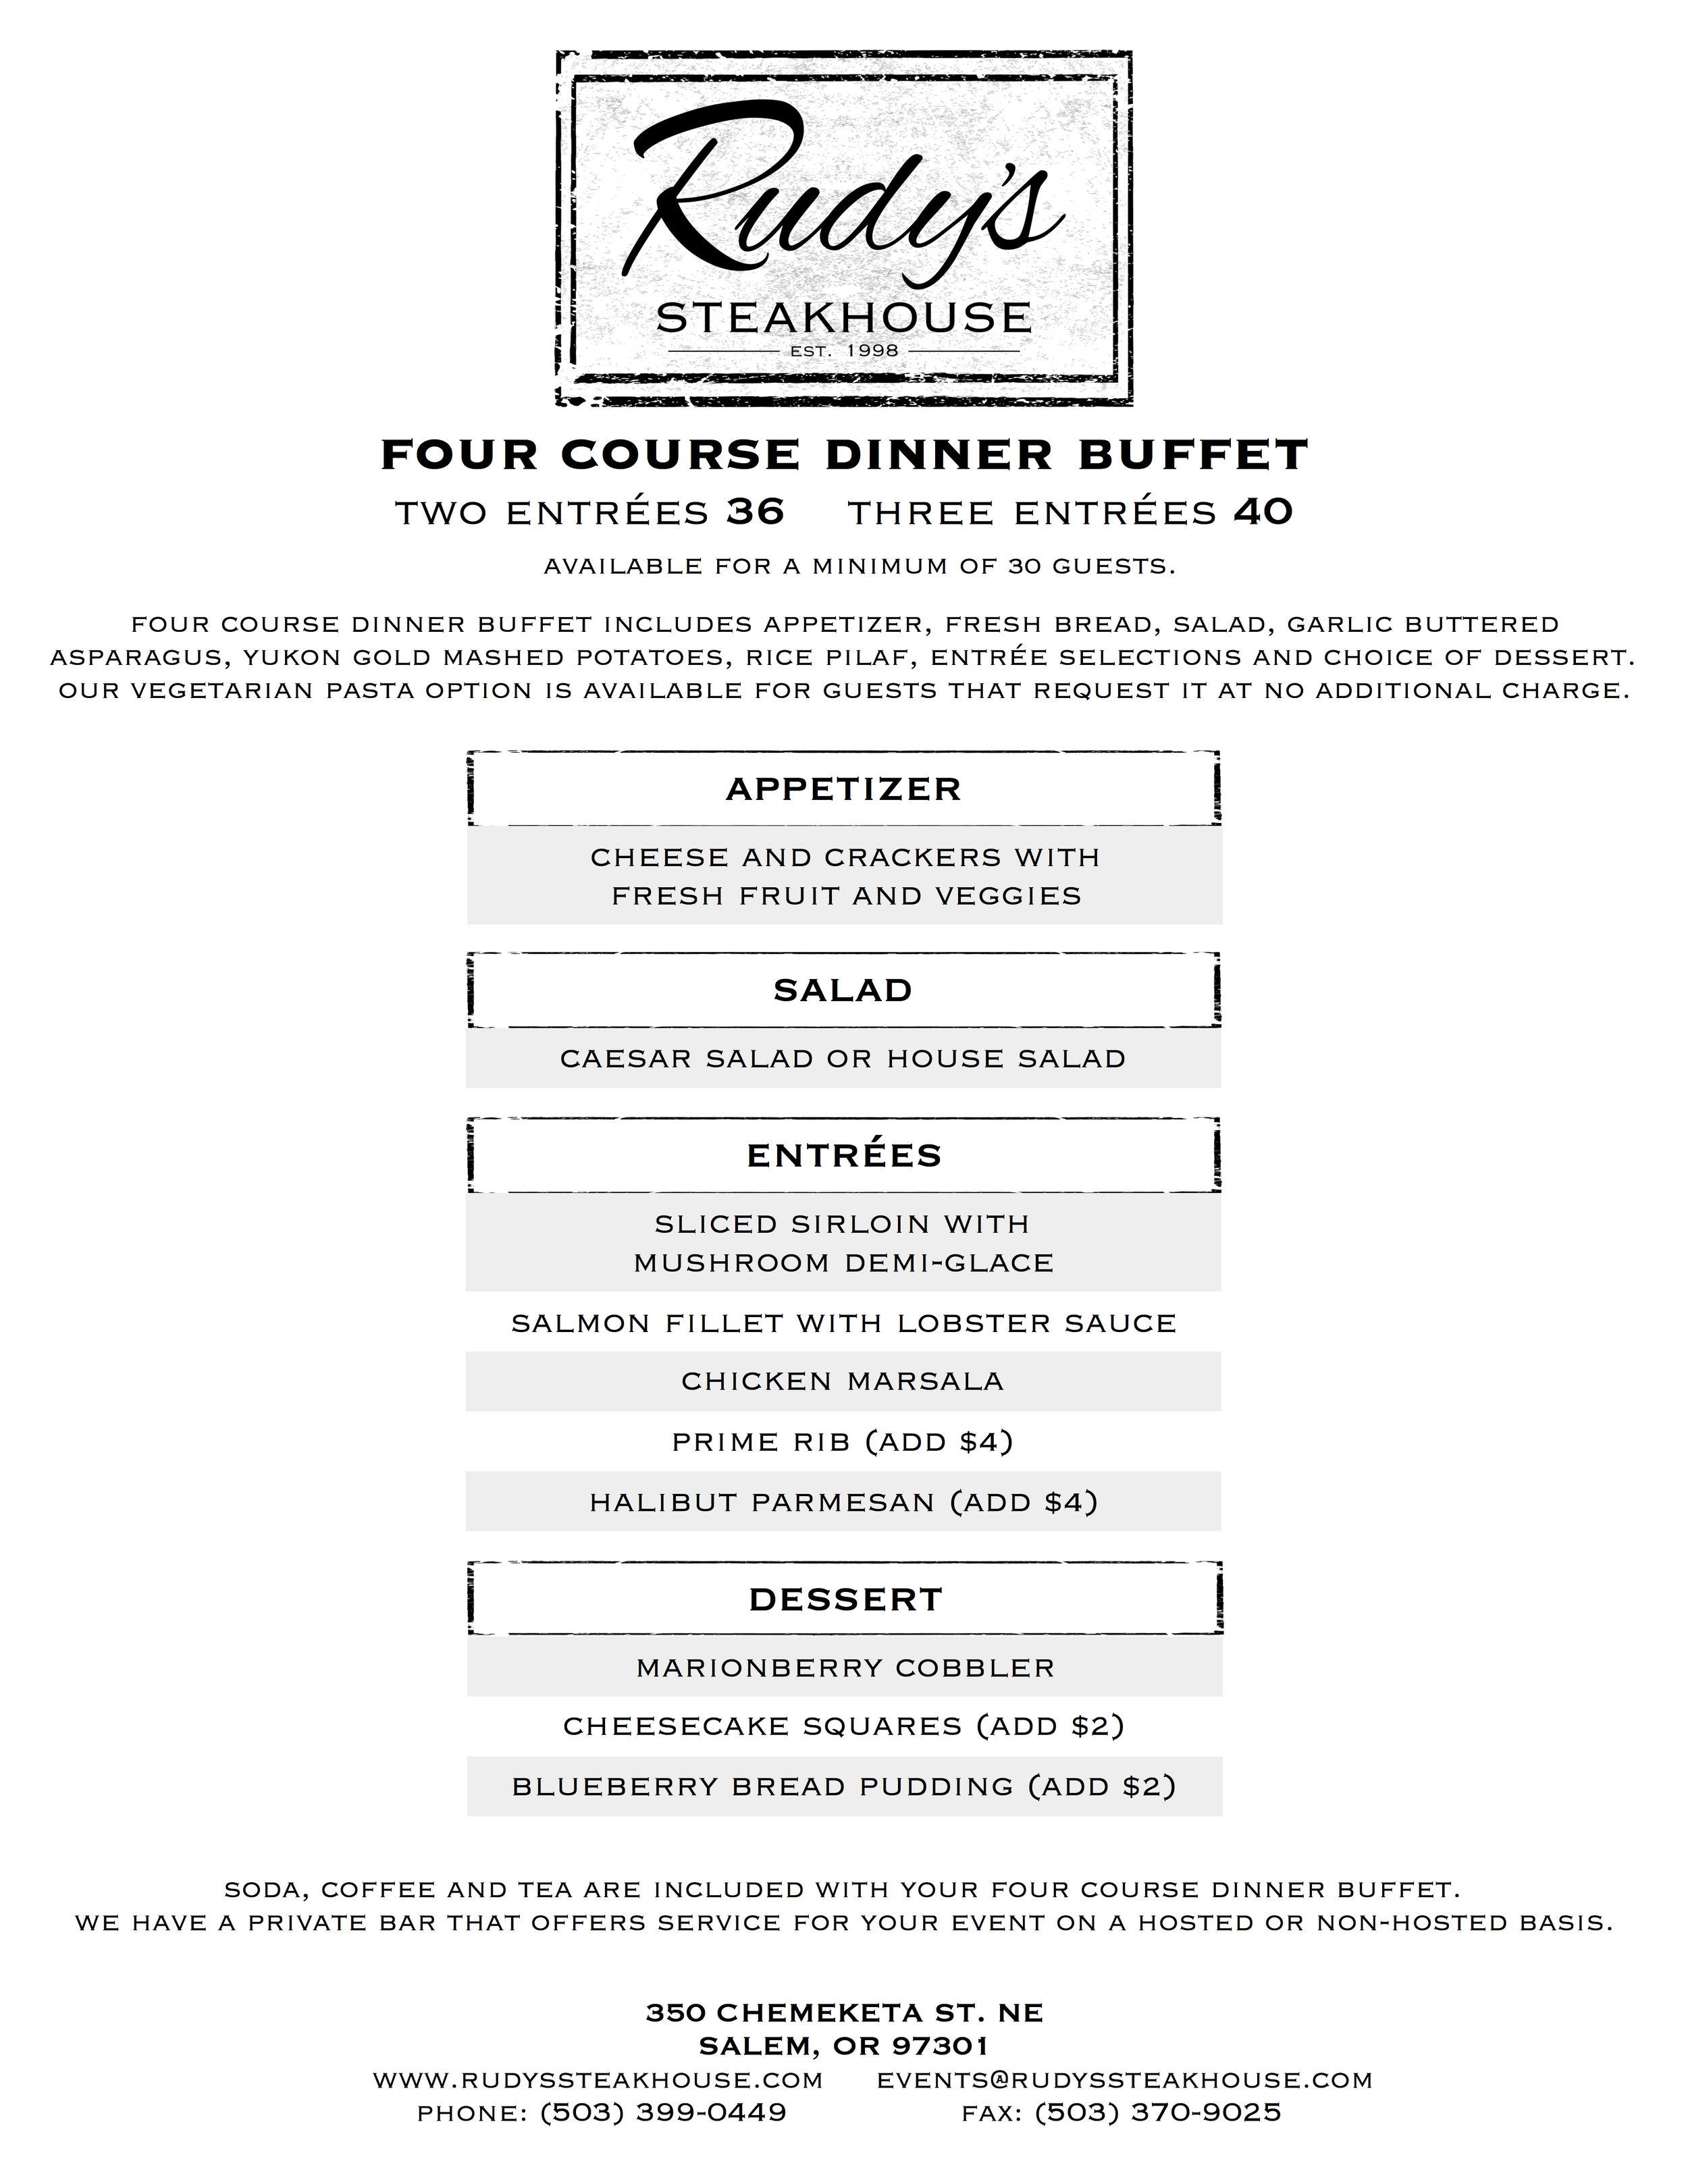 Rudy's Steakhouse Buffet Options.jpg